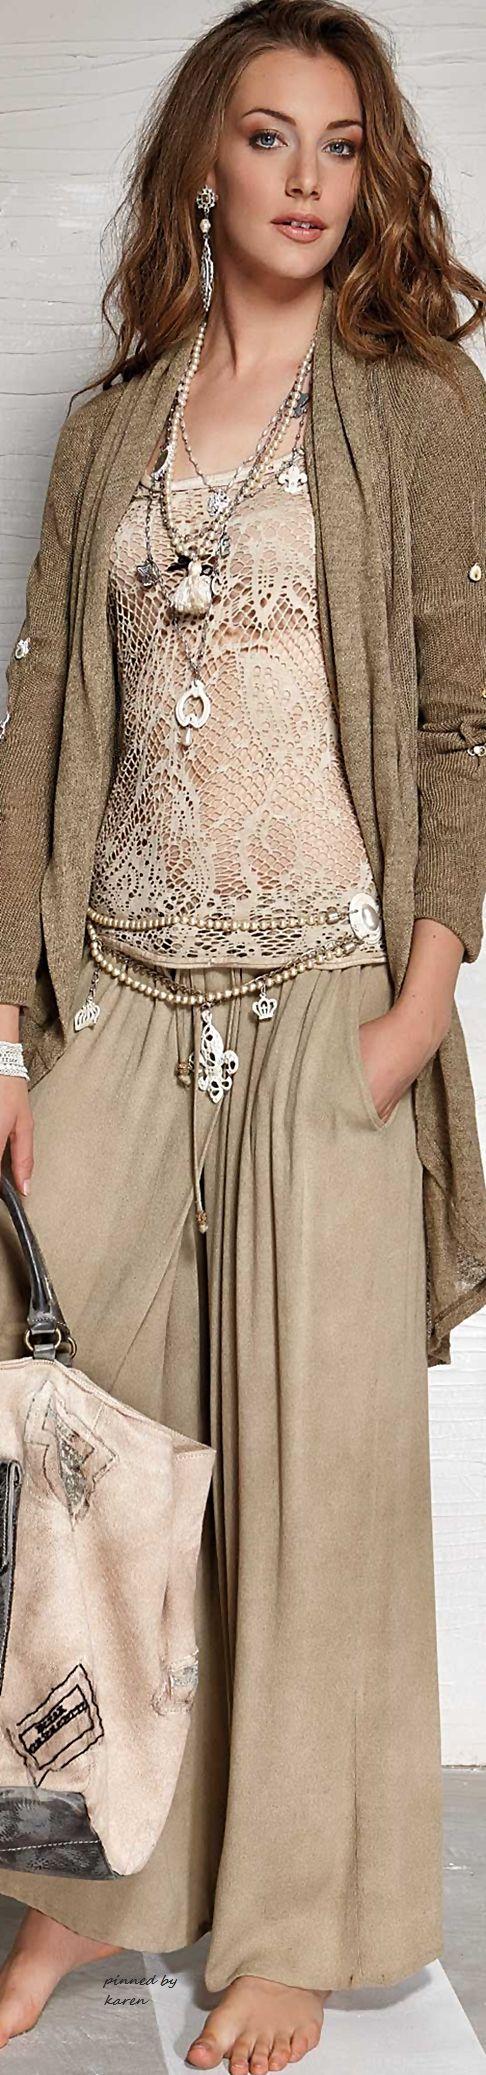 Boho Style Chic • I love love love this!  ≫∙∙☮ Bohème Babe ☮∙∙≪• ❤️ Babz ✿ιиѕριяαтισи❀ #abbigliamento #bohojewelry #boho